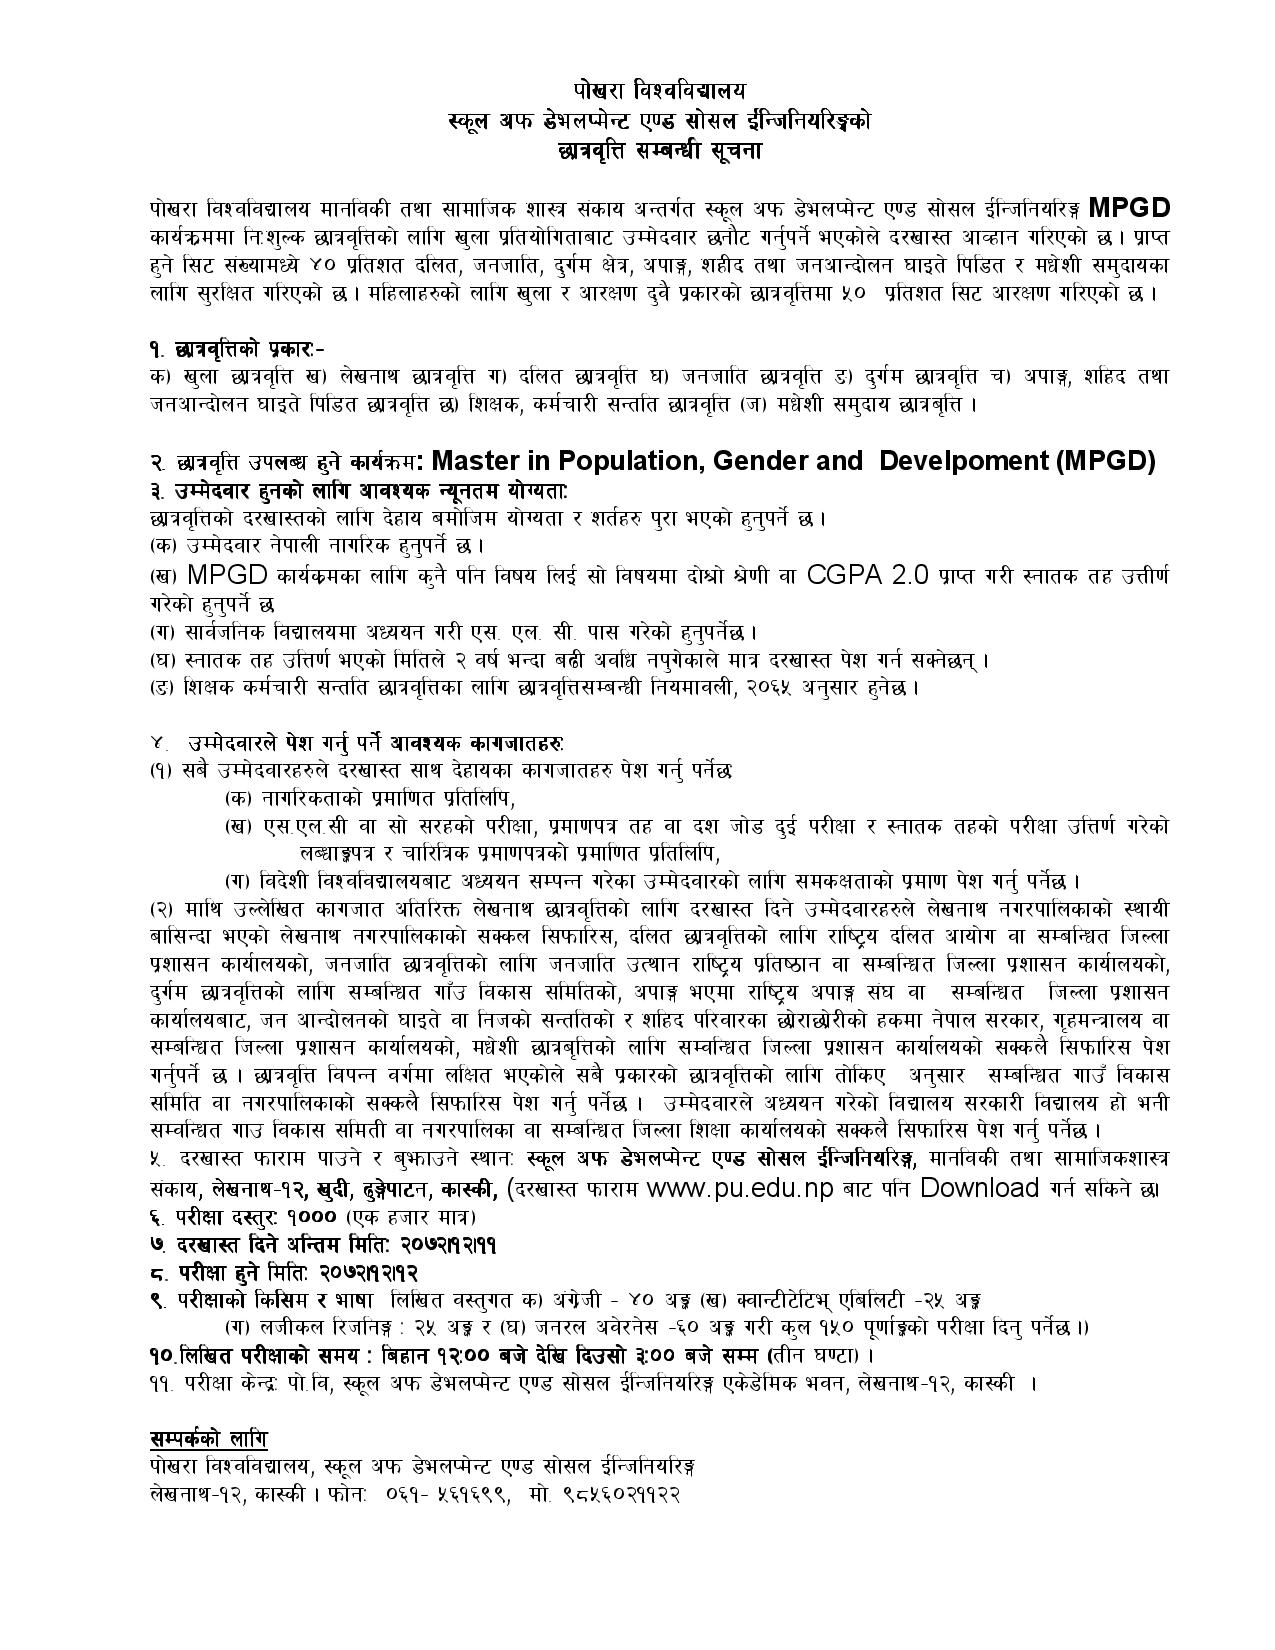 Scholarship Notice MPGD 2016